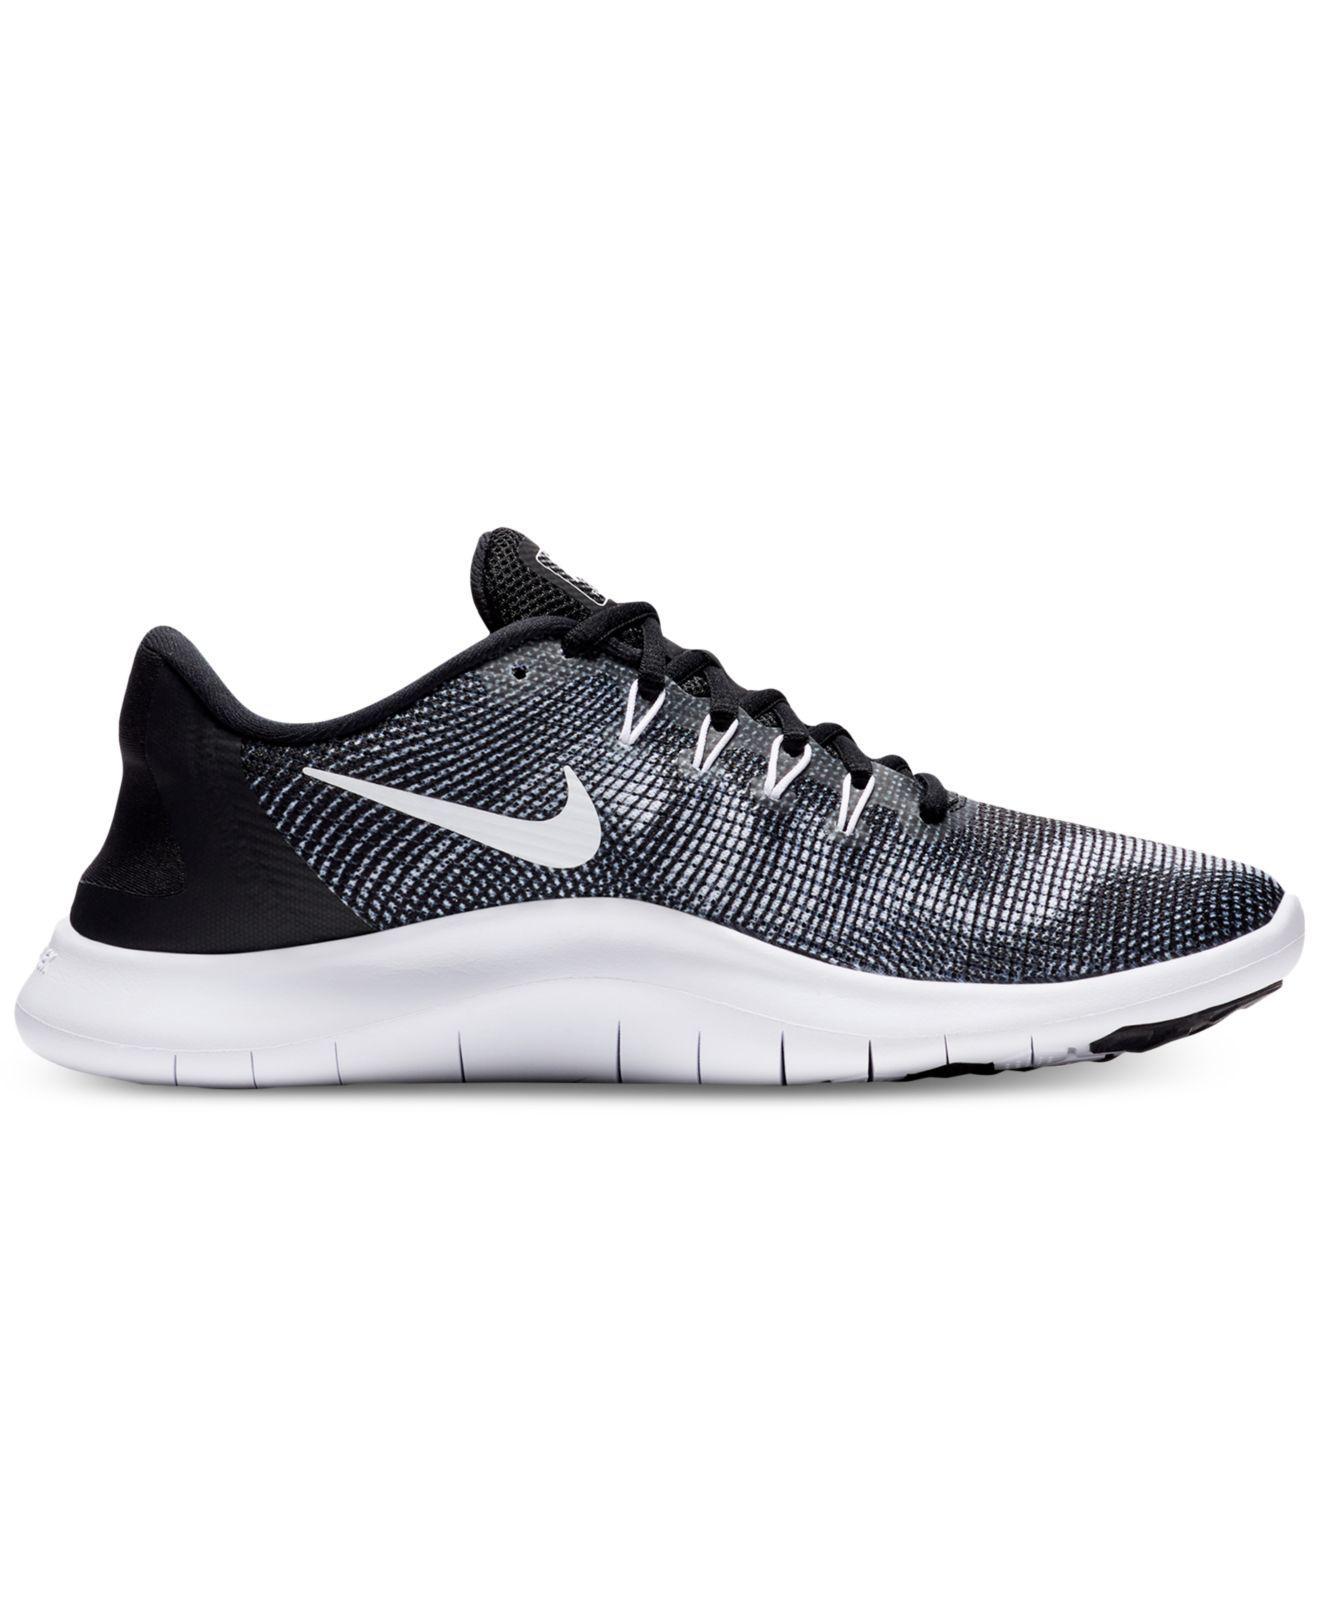 8e36a00520f0f Lyst - Nike Flex Rn 2018 Mesh Sneaker in Black for Men - Save 51%